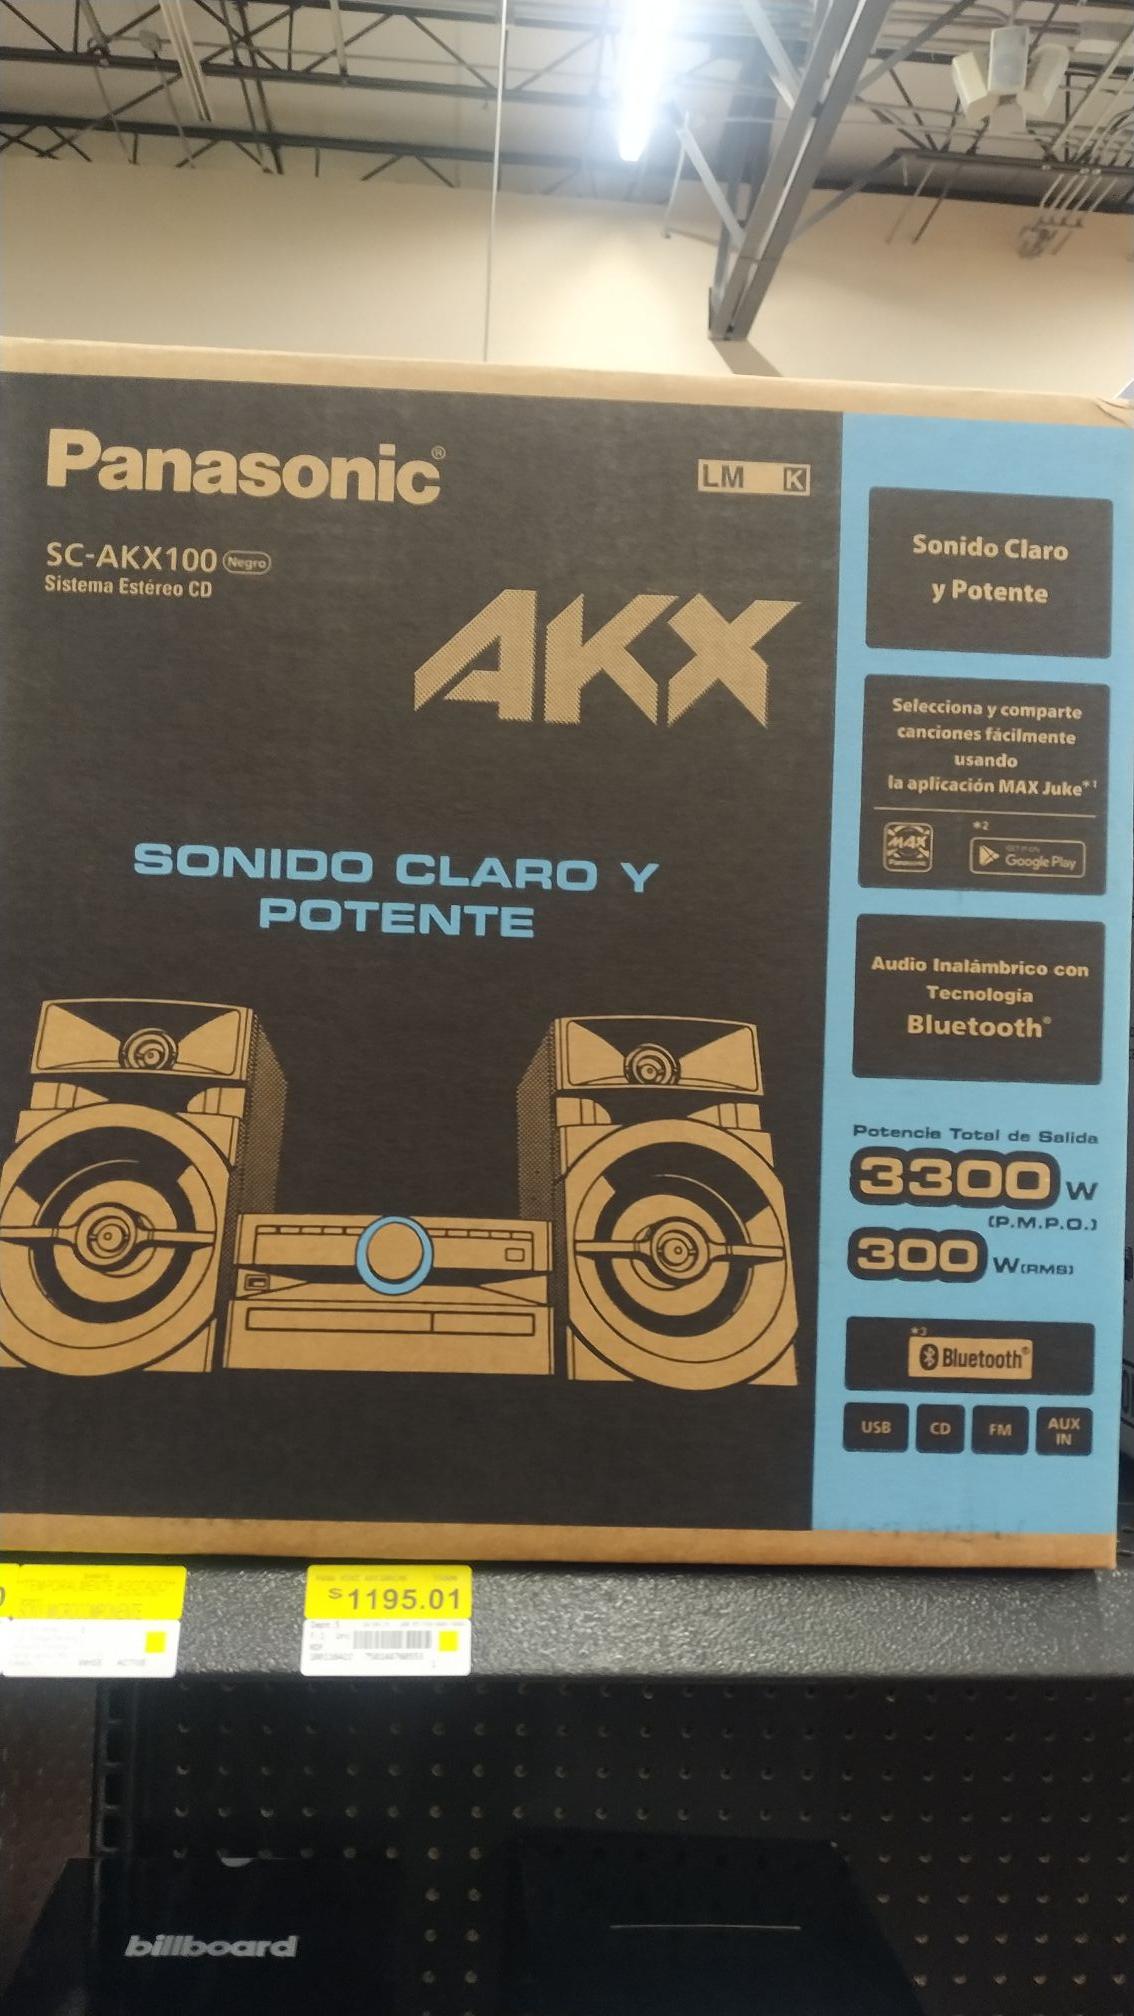 Walmart: Minicomponente Panasonic